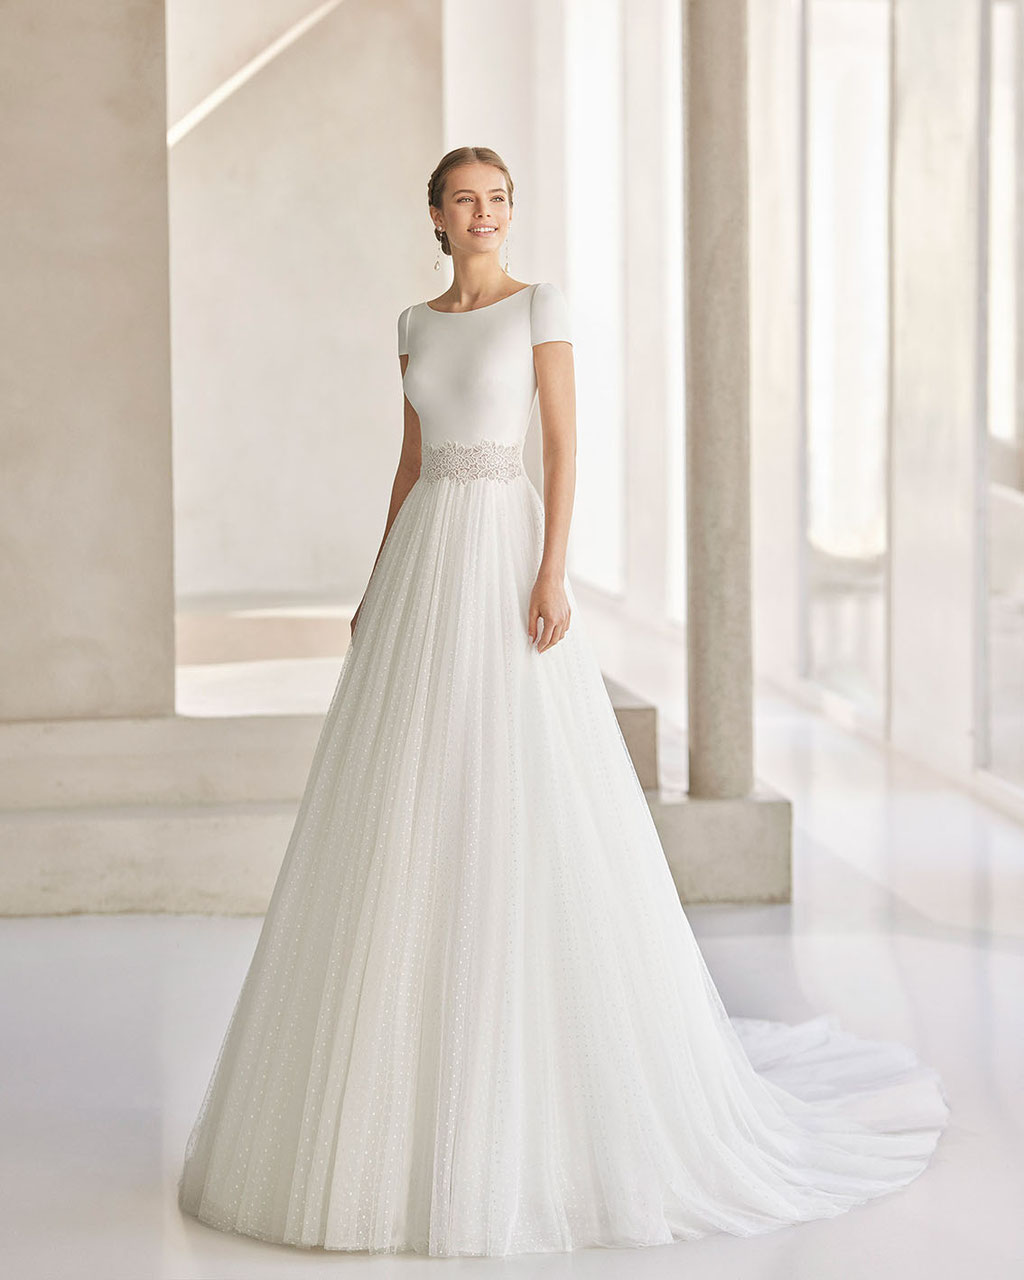 Rosa Clará Couture 2022